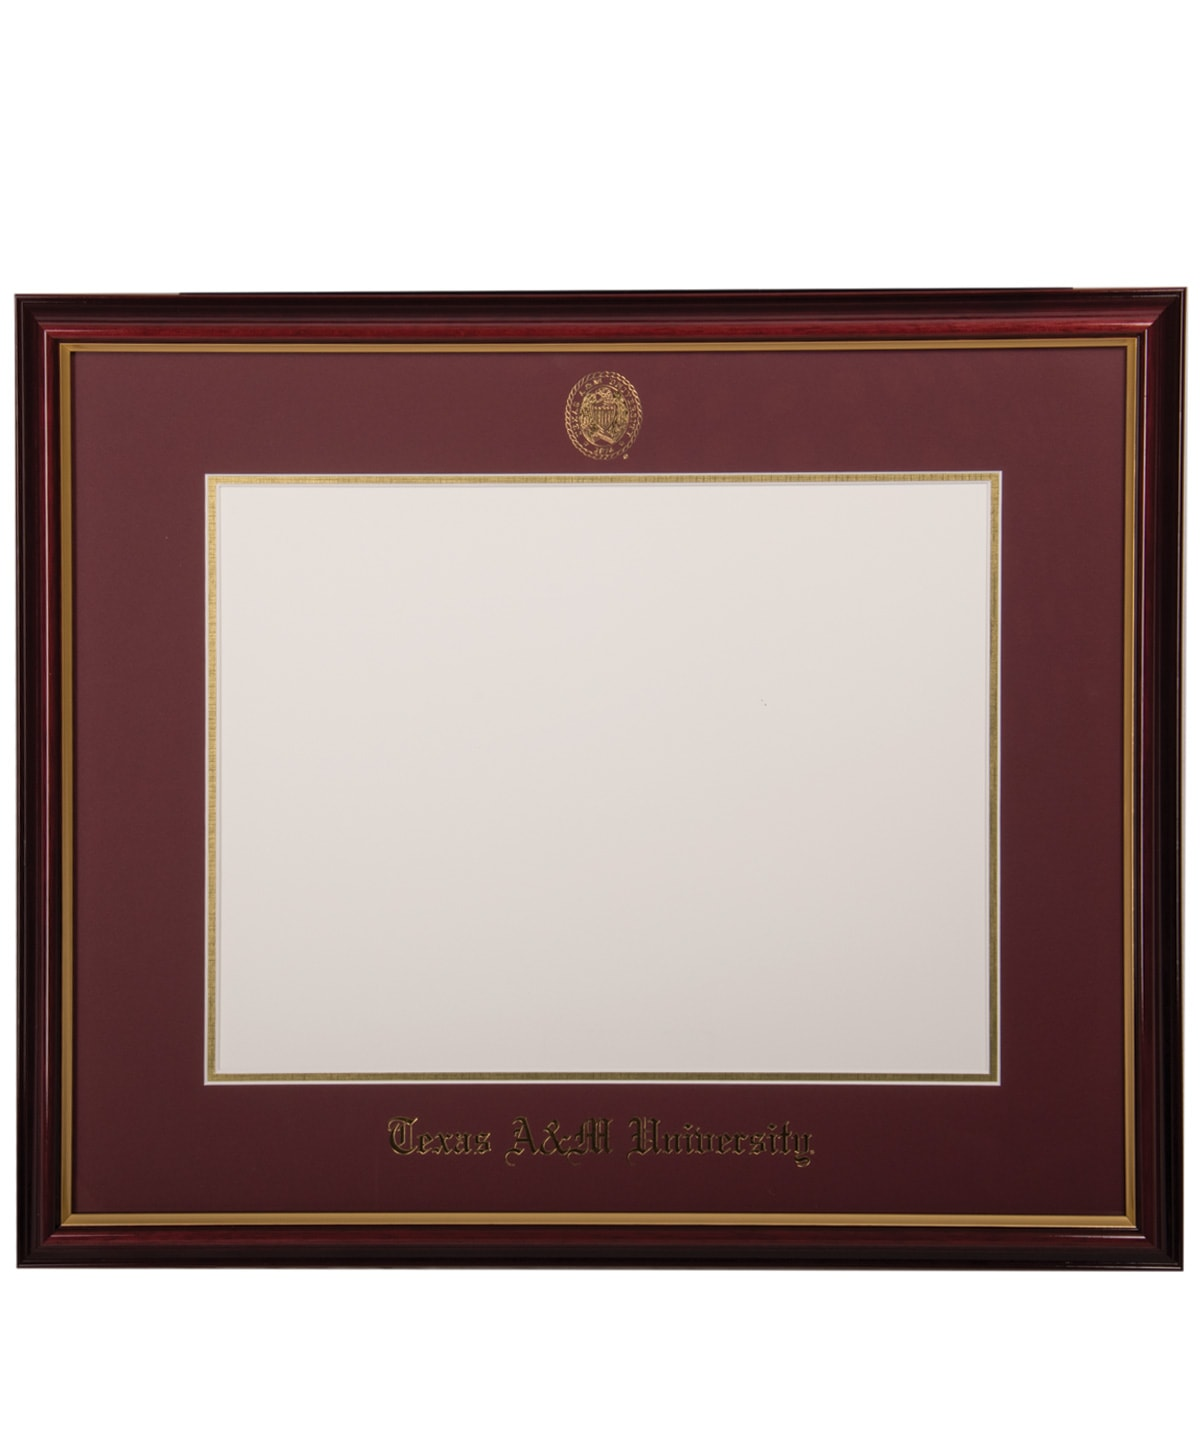 University Frames Texas A&M Petite Diploma Frame Maroon | Aggieland ...